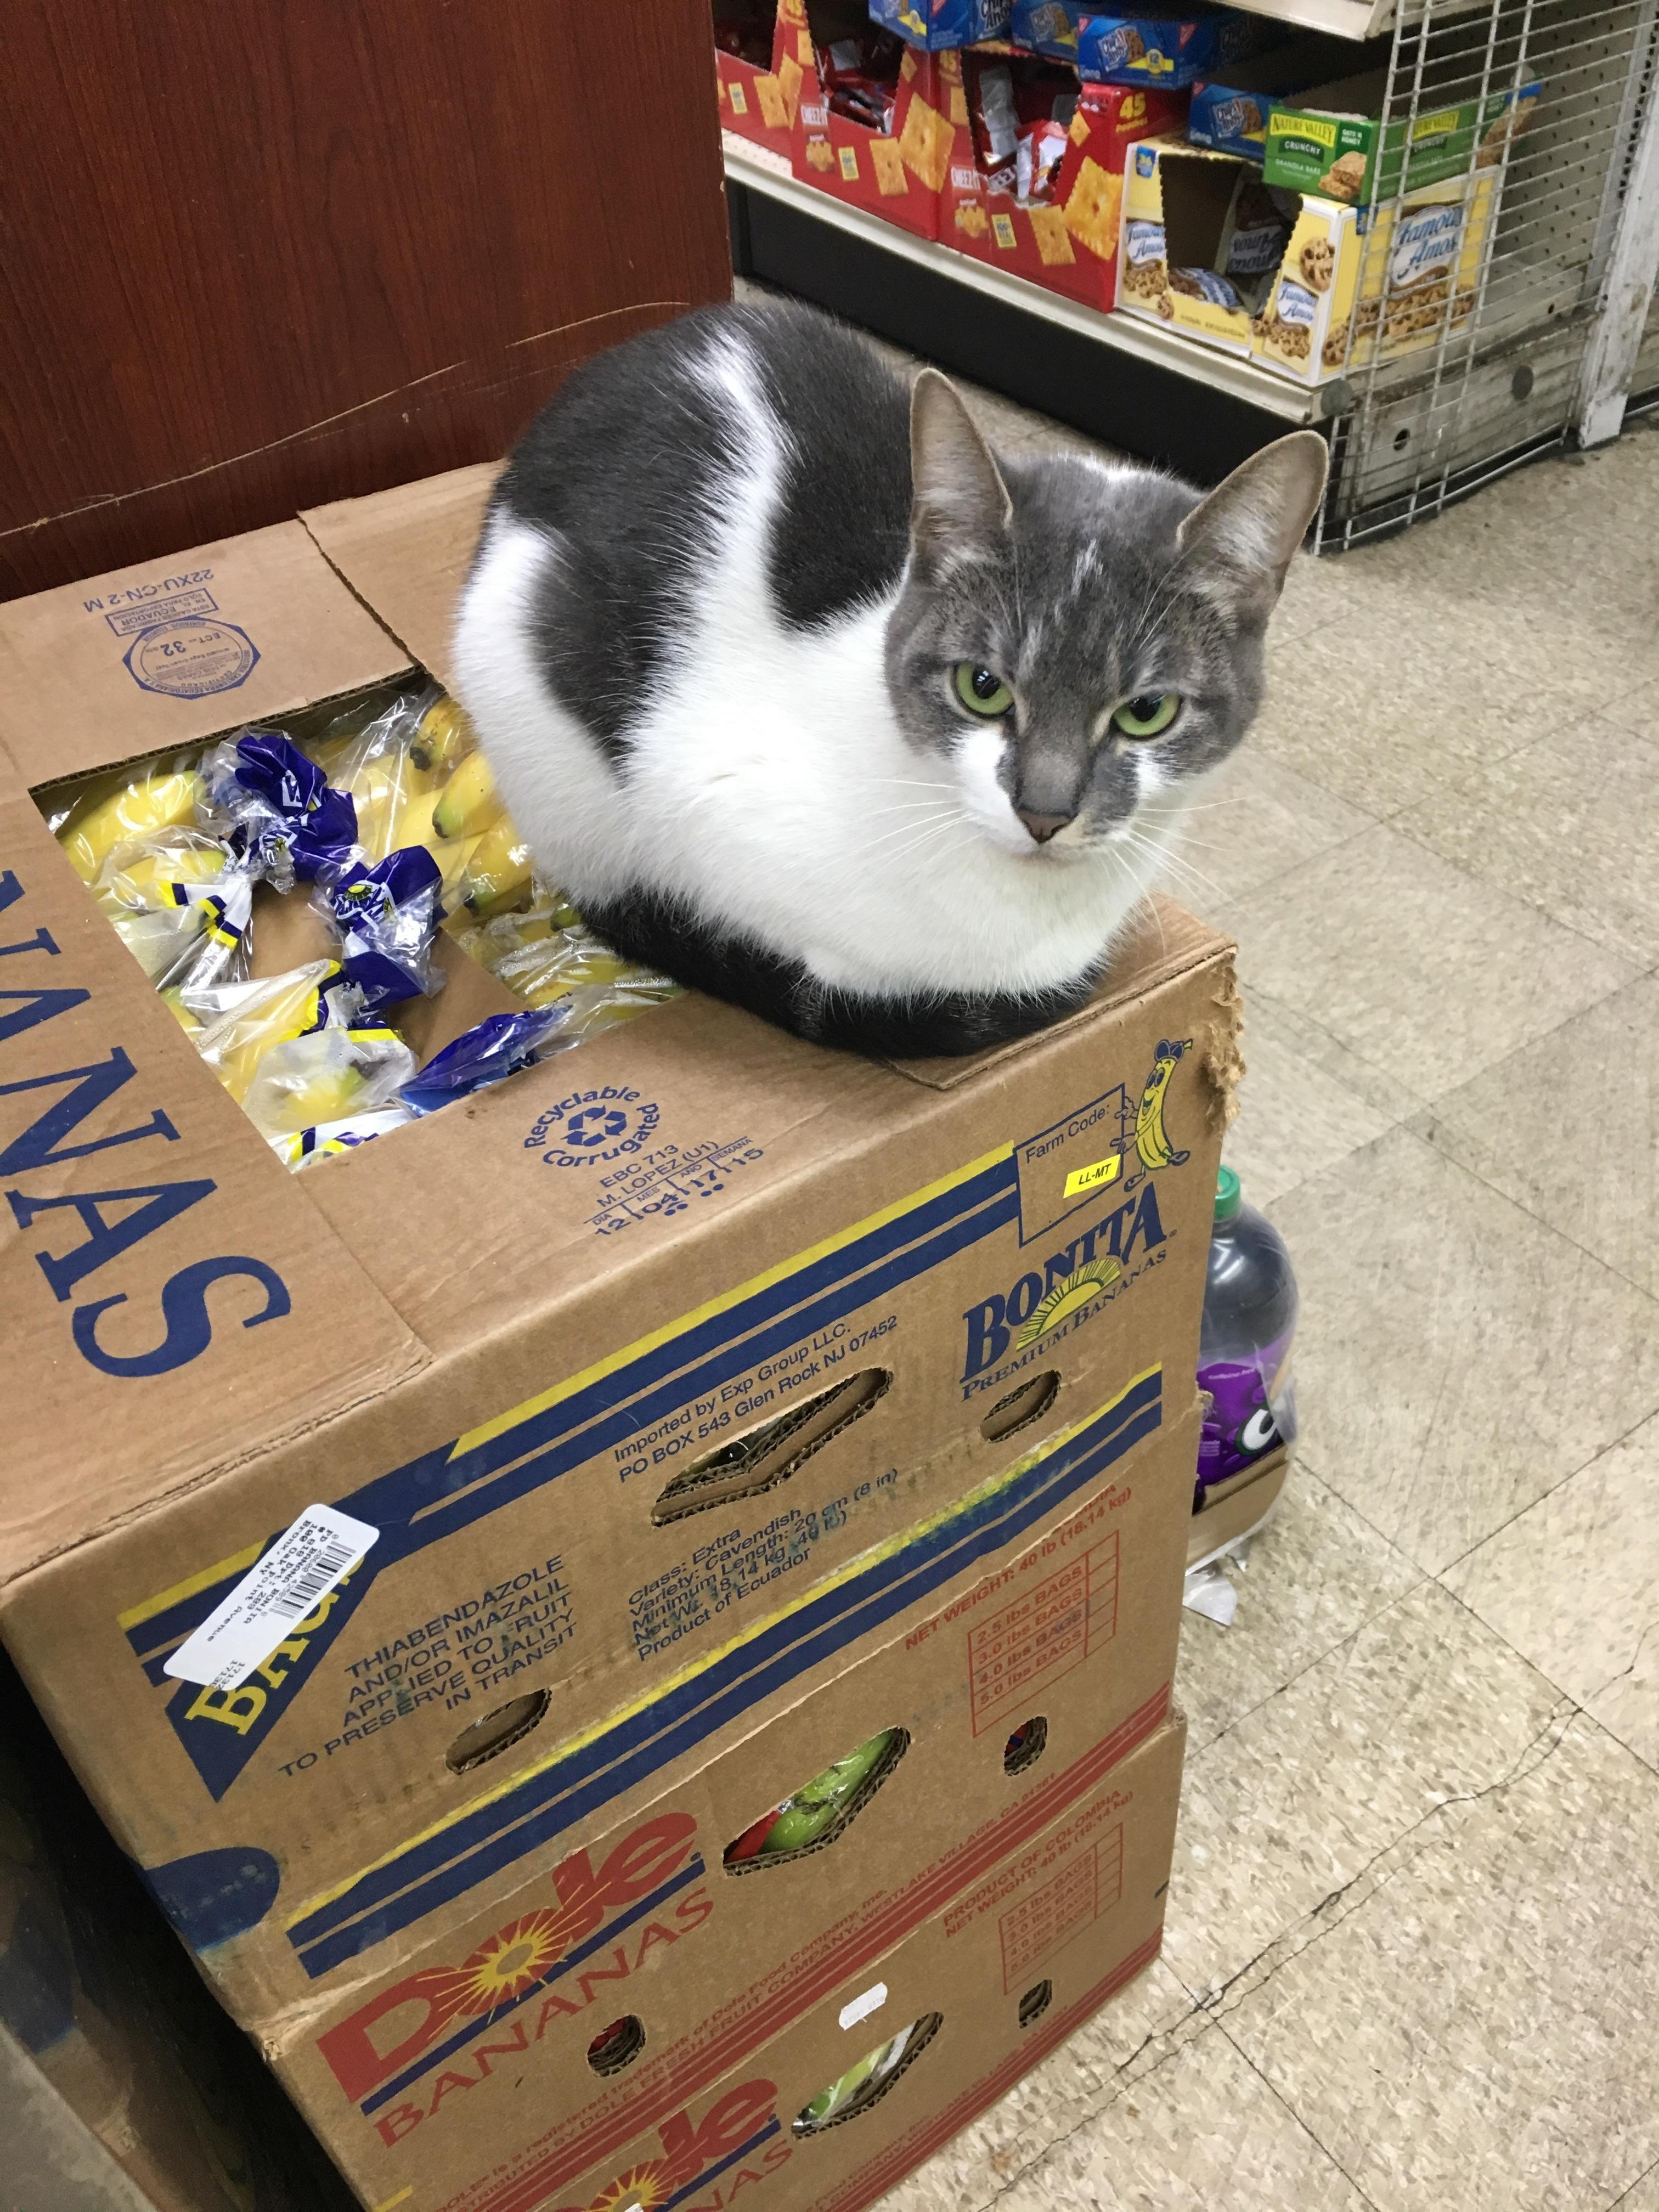 Bodega (Market) Cat http://ift.tt/2rxcLoT